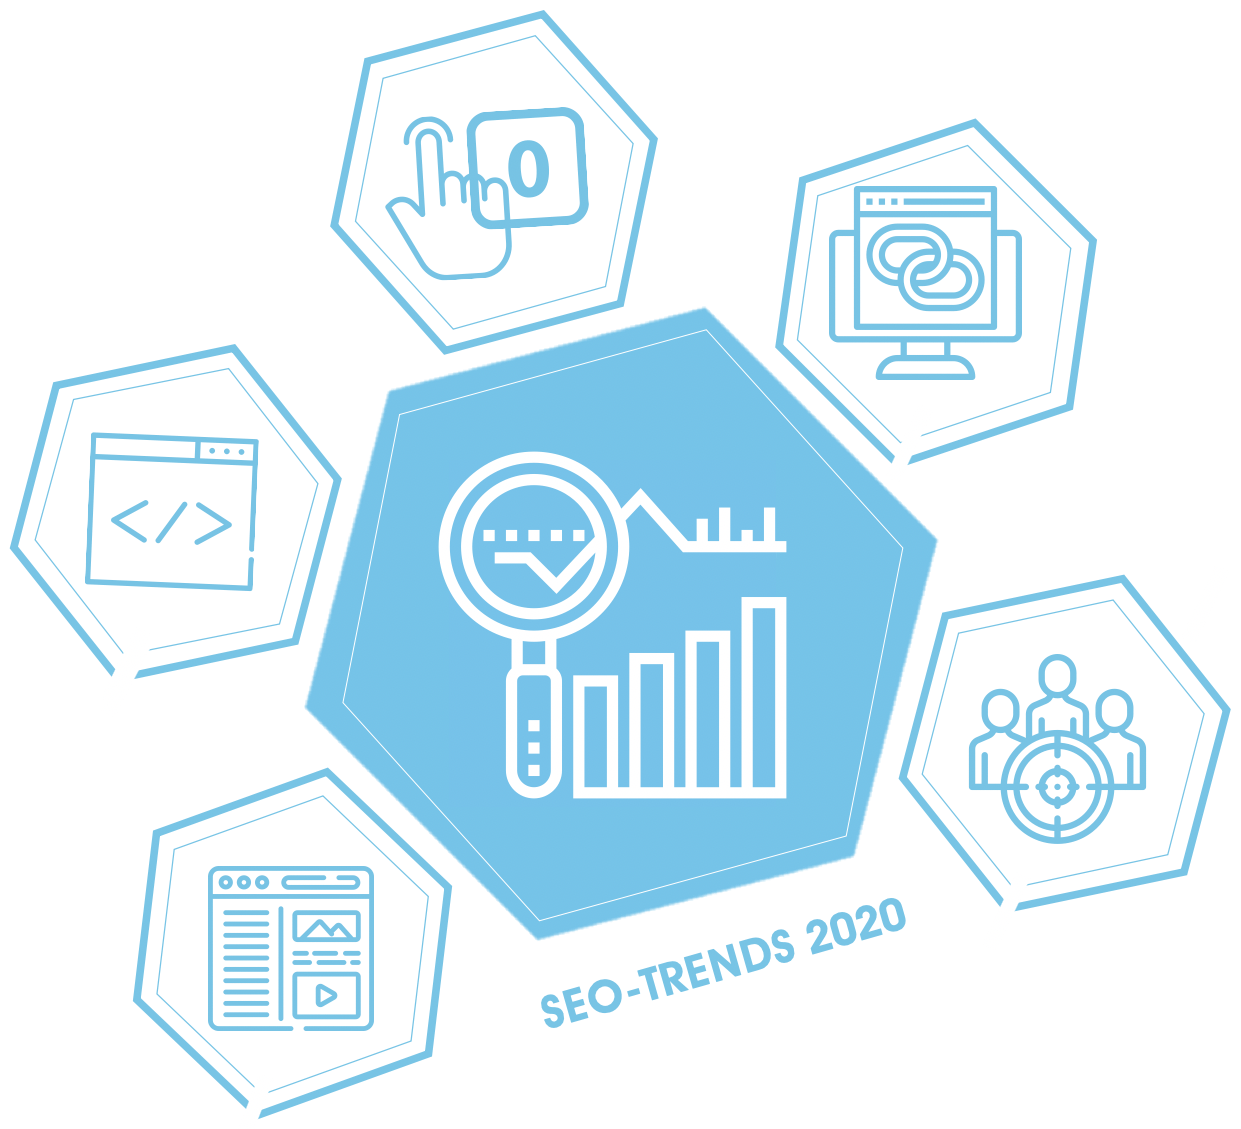 SEO-Trends 2020